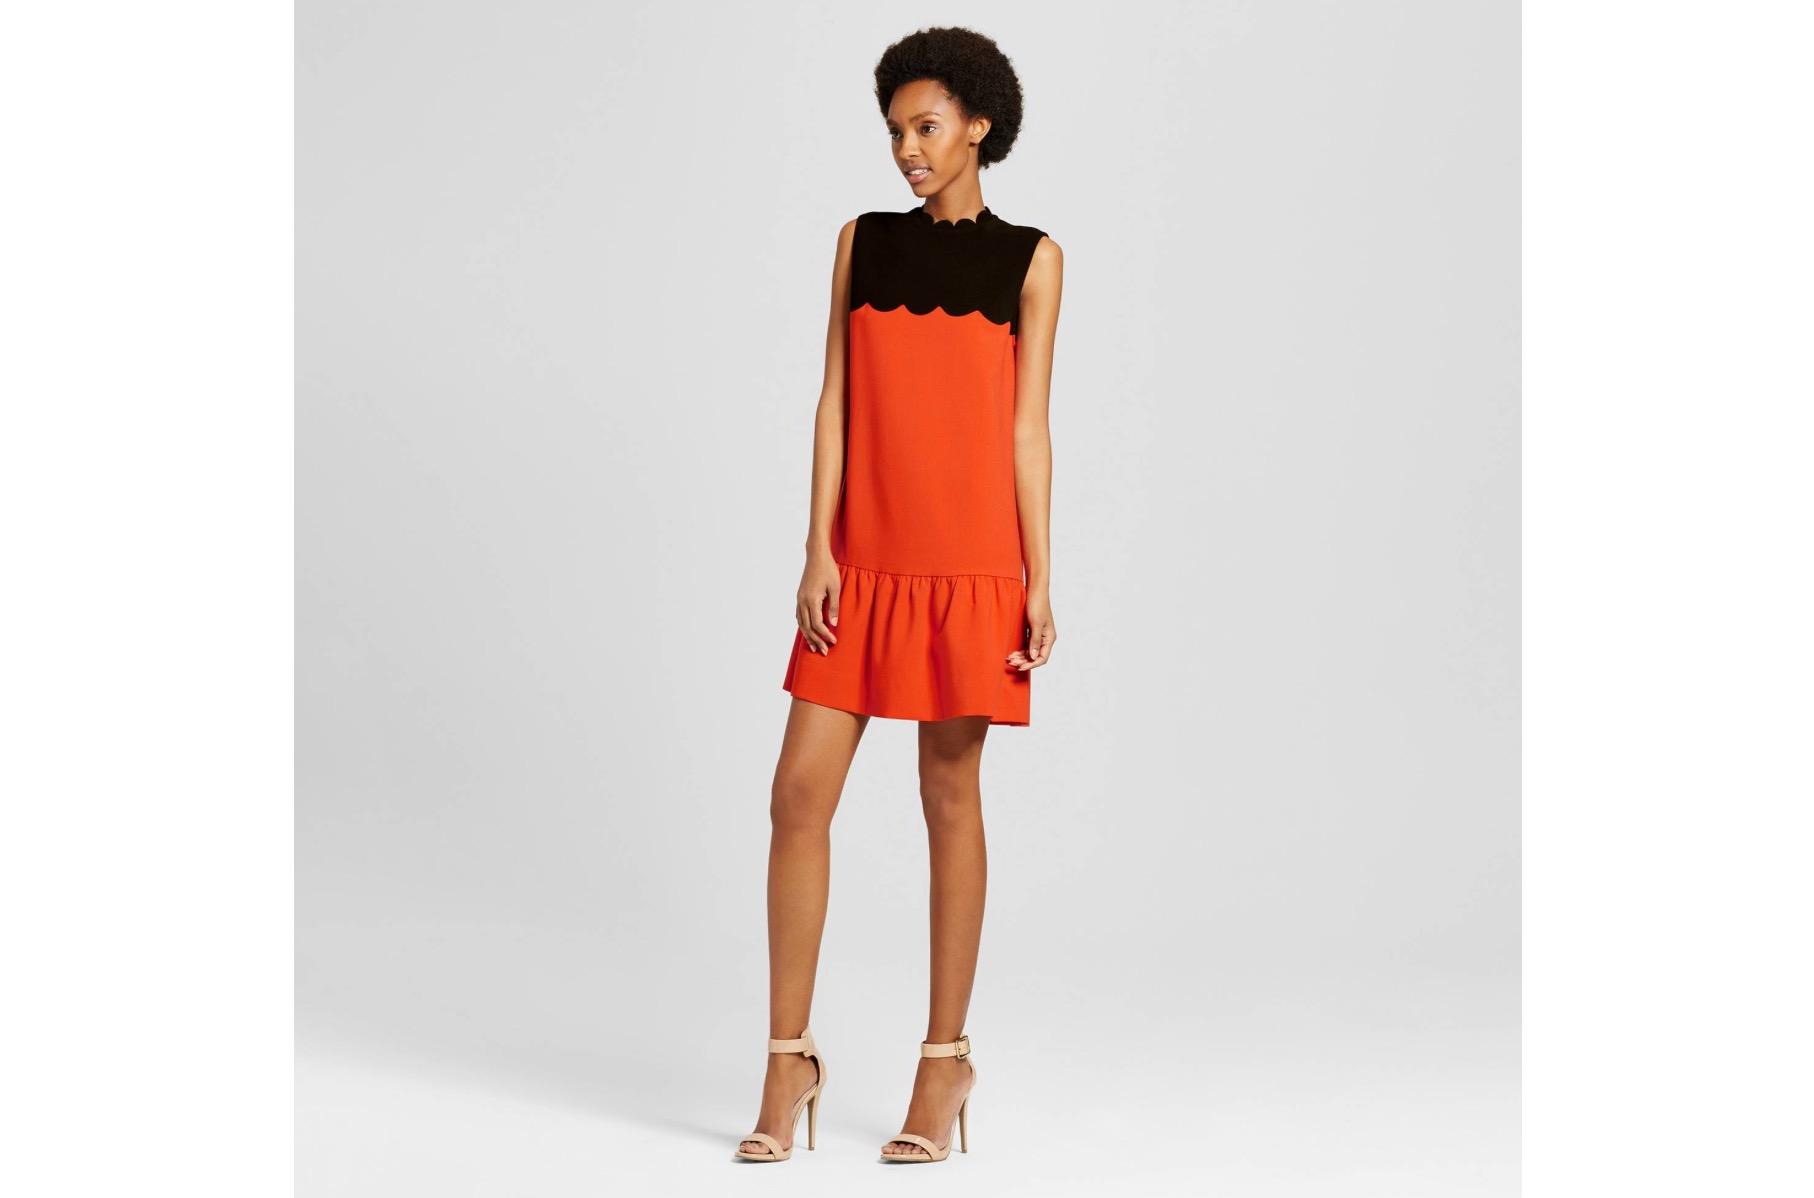 Style: Victoria Beckham at Target